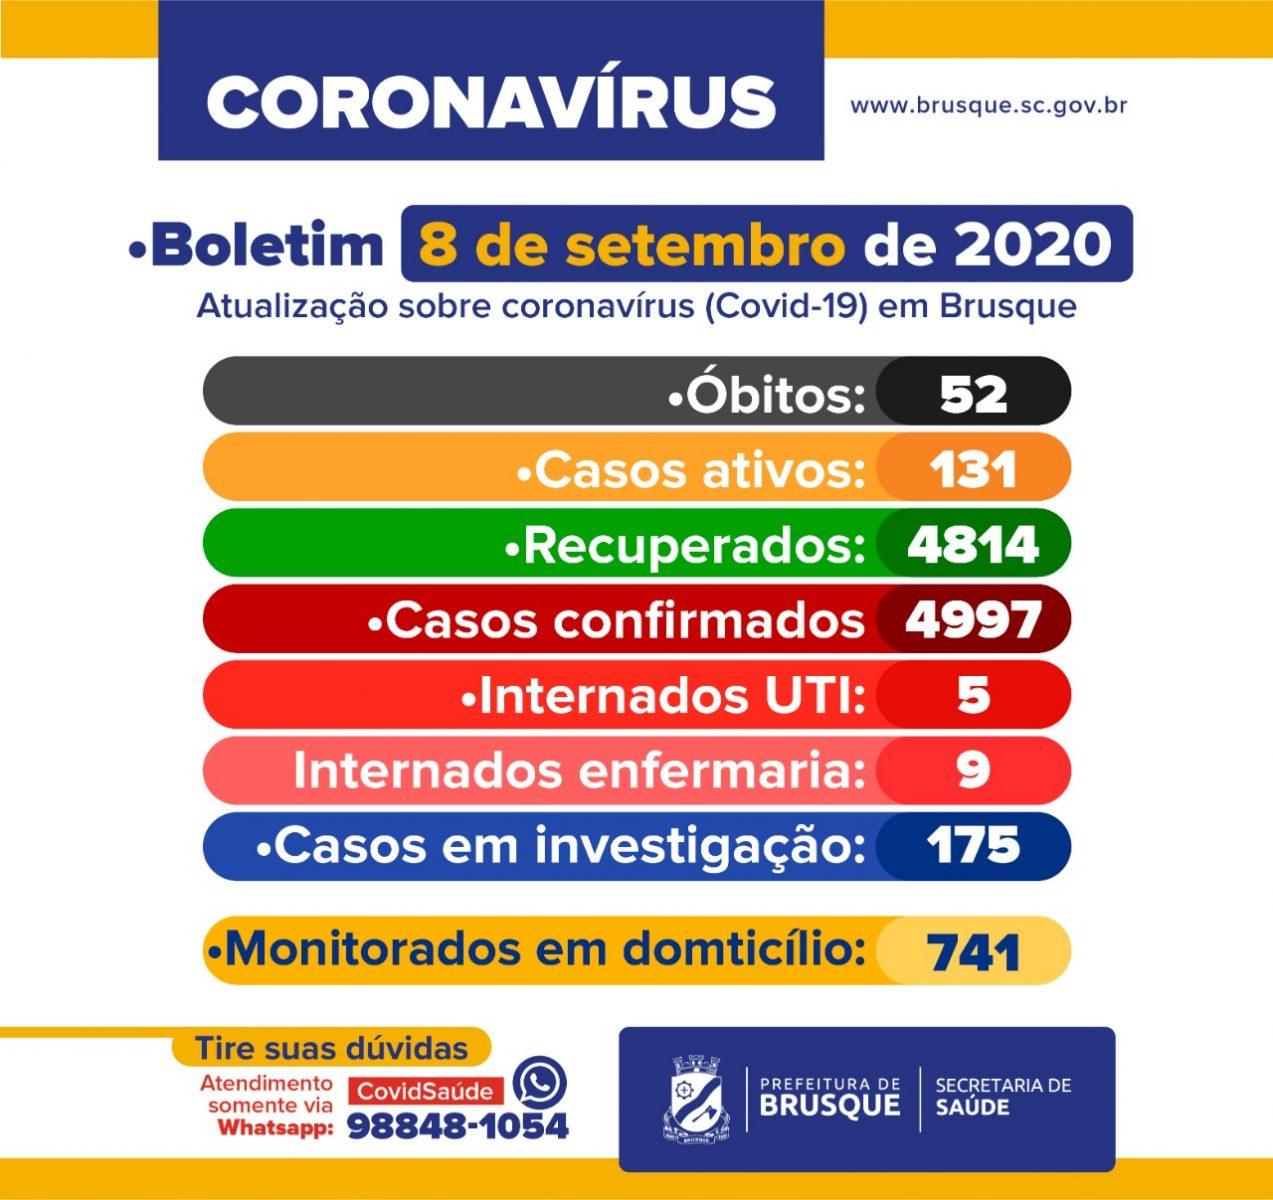 COVID-19: Boletim epidemiológico desta terça-feira, 8 de setembro